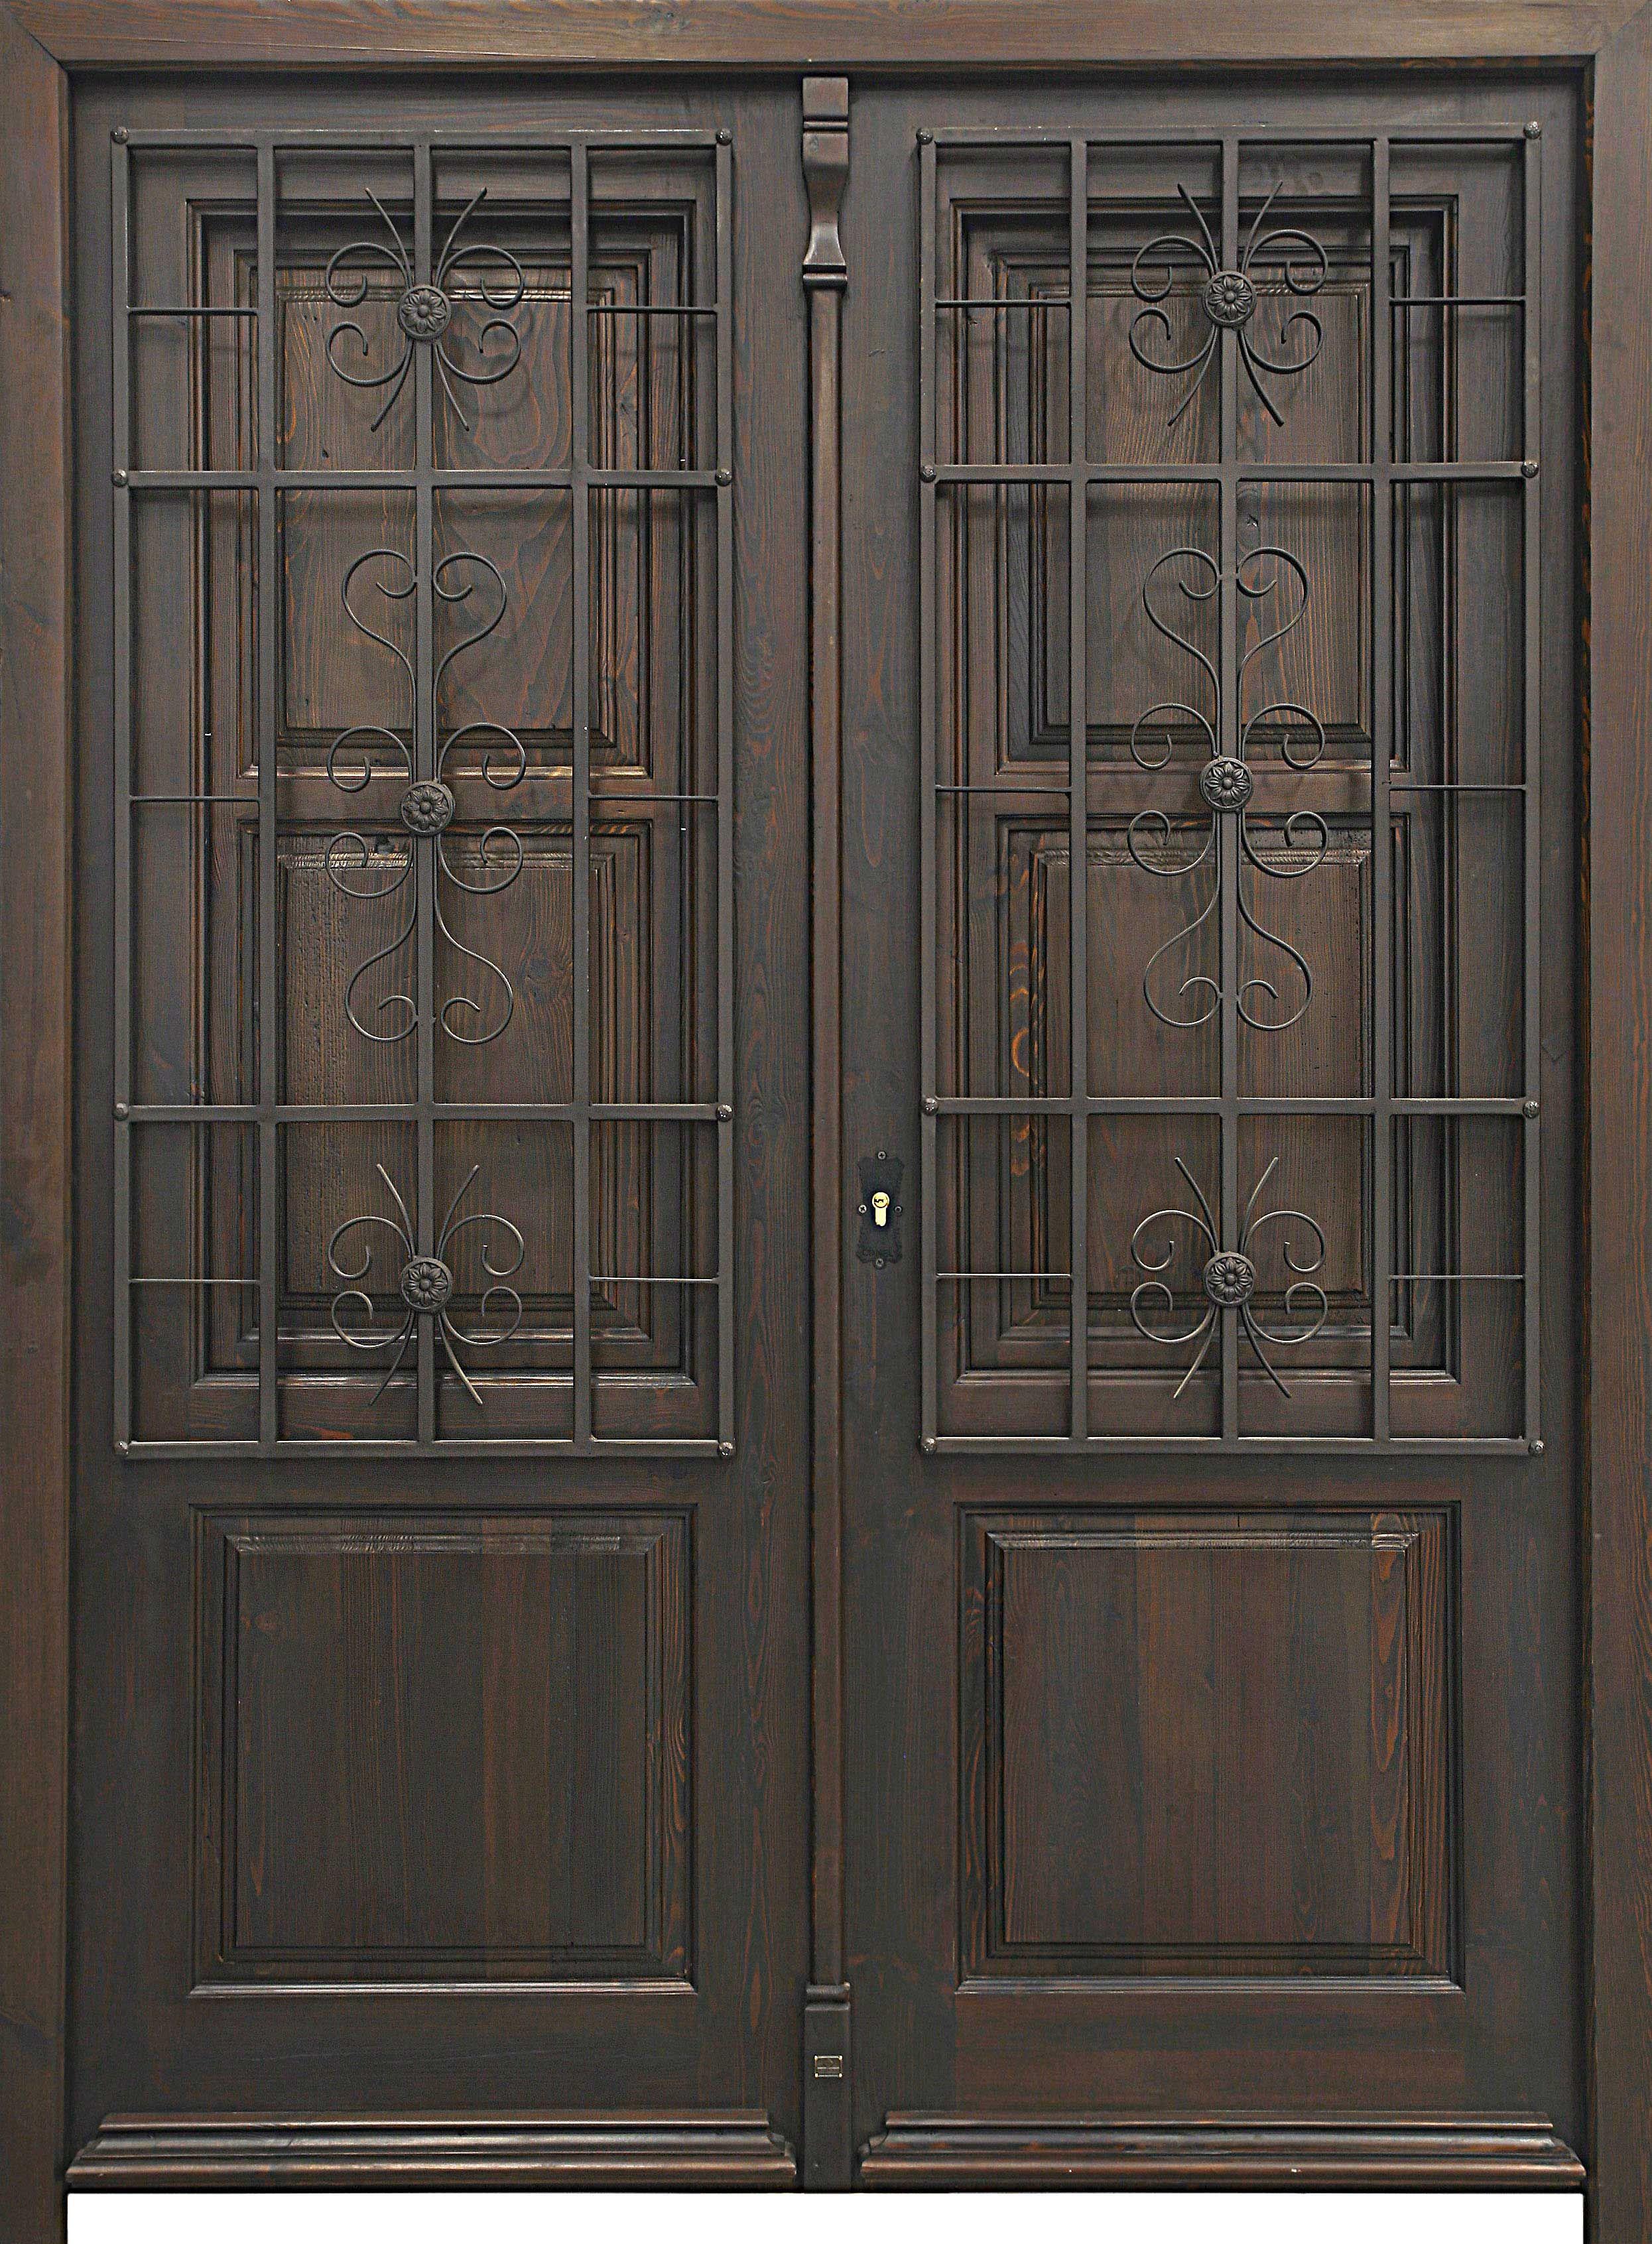 Araceli doble exquisite doors gates pinterest puertas puertas de madera and madera - Rejas de forja antiguas ...